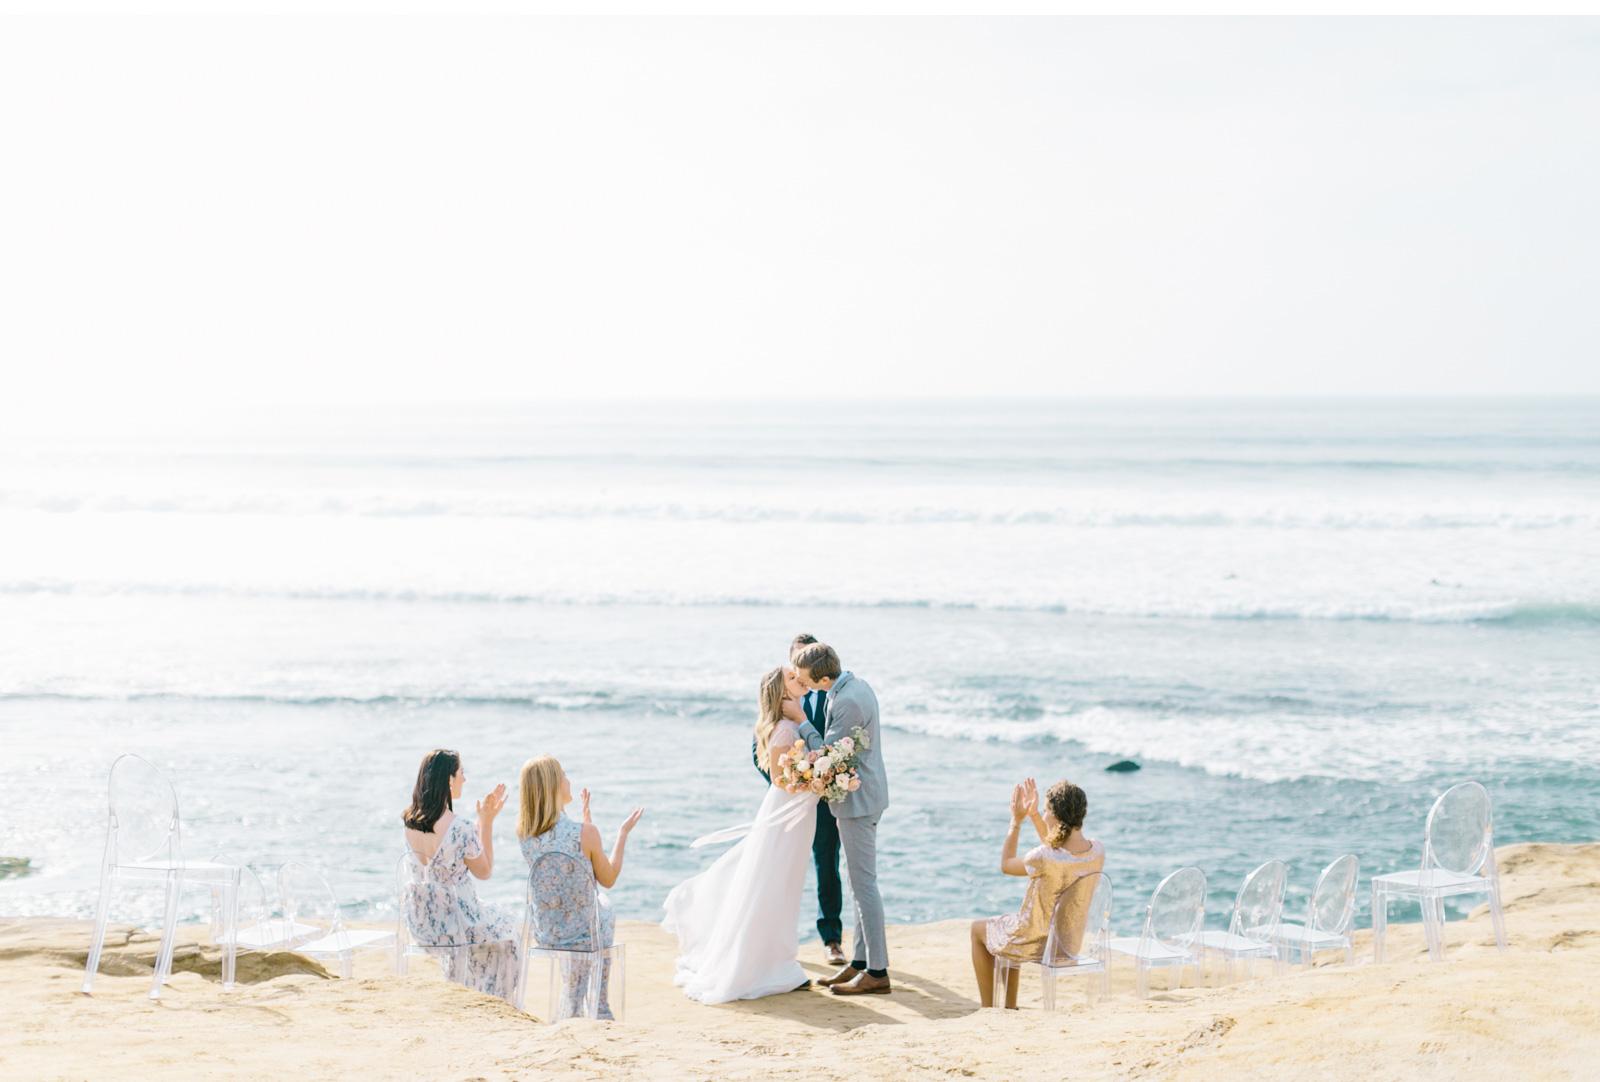 Style-Me-Pretty-California-Beach-Wedding-Natalie-Schutt-Photography_03.jpg